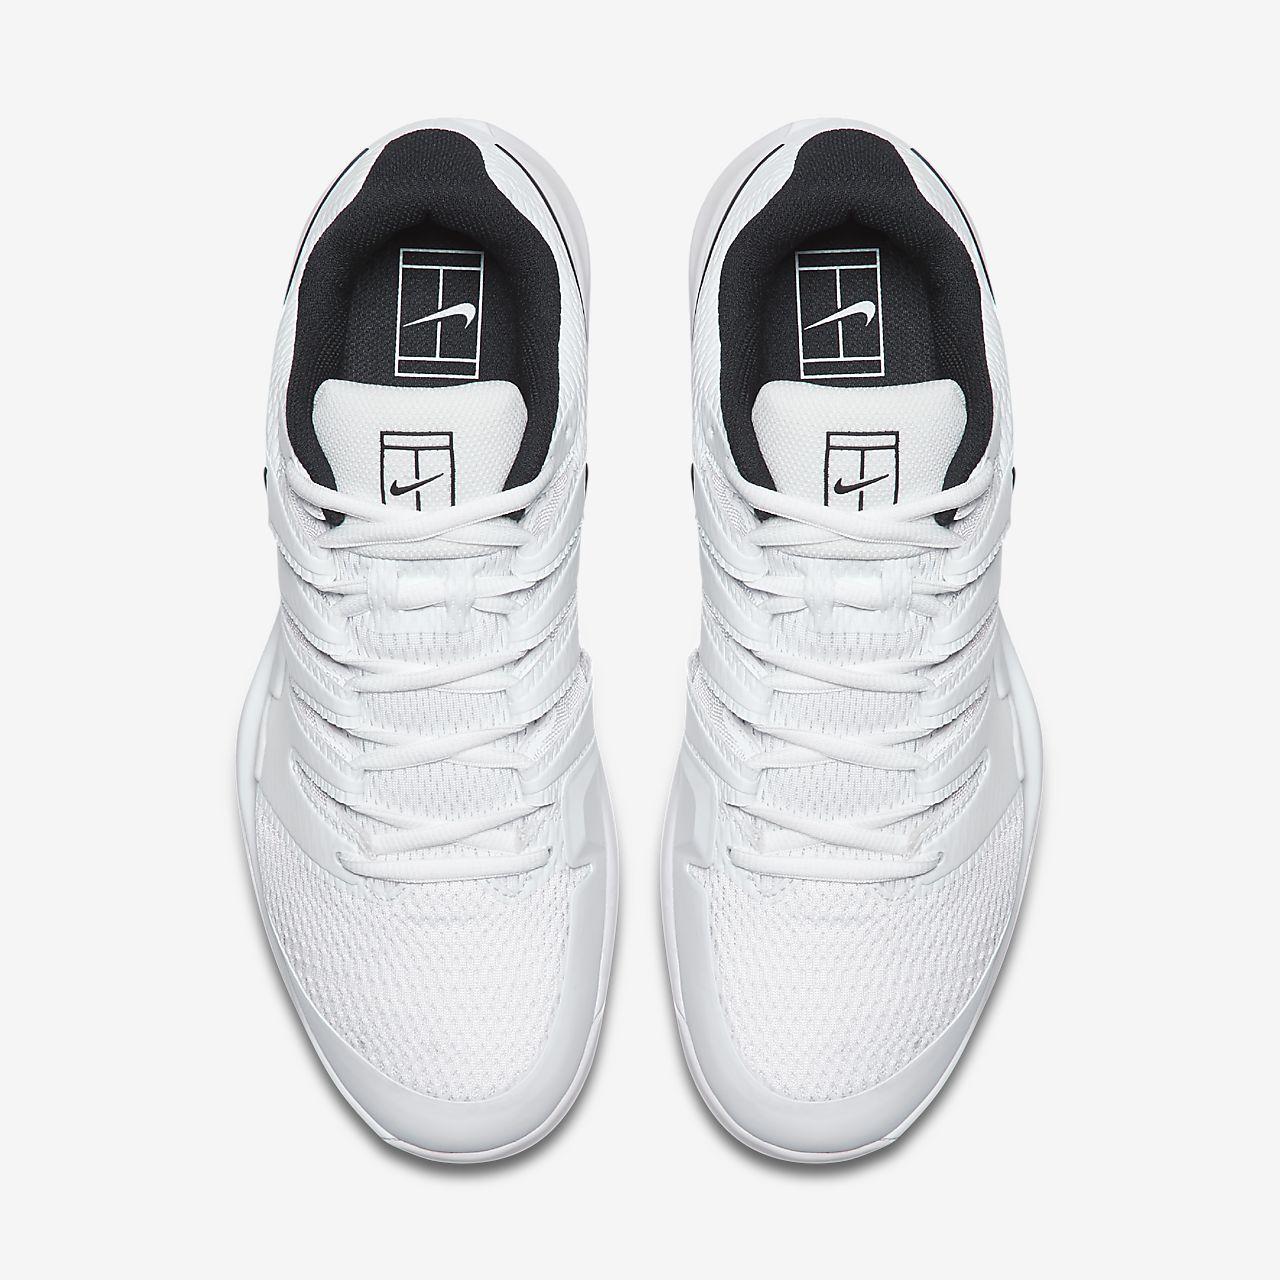 san francisco 7a109 fab00 ... Chaussure de tennis Nike Air Zoom Vapor X HC pour Homme